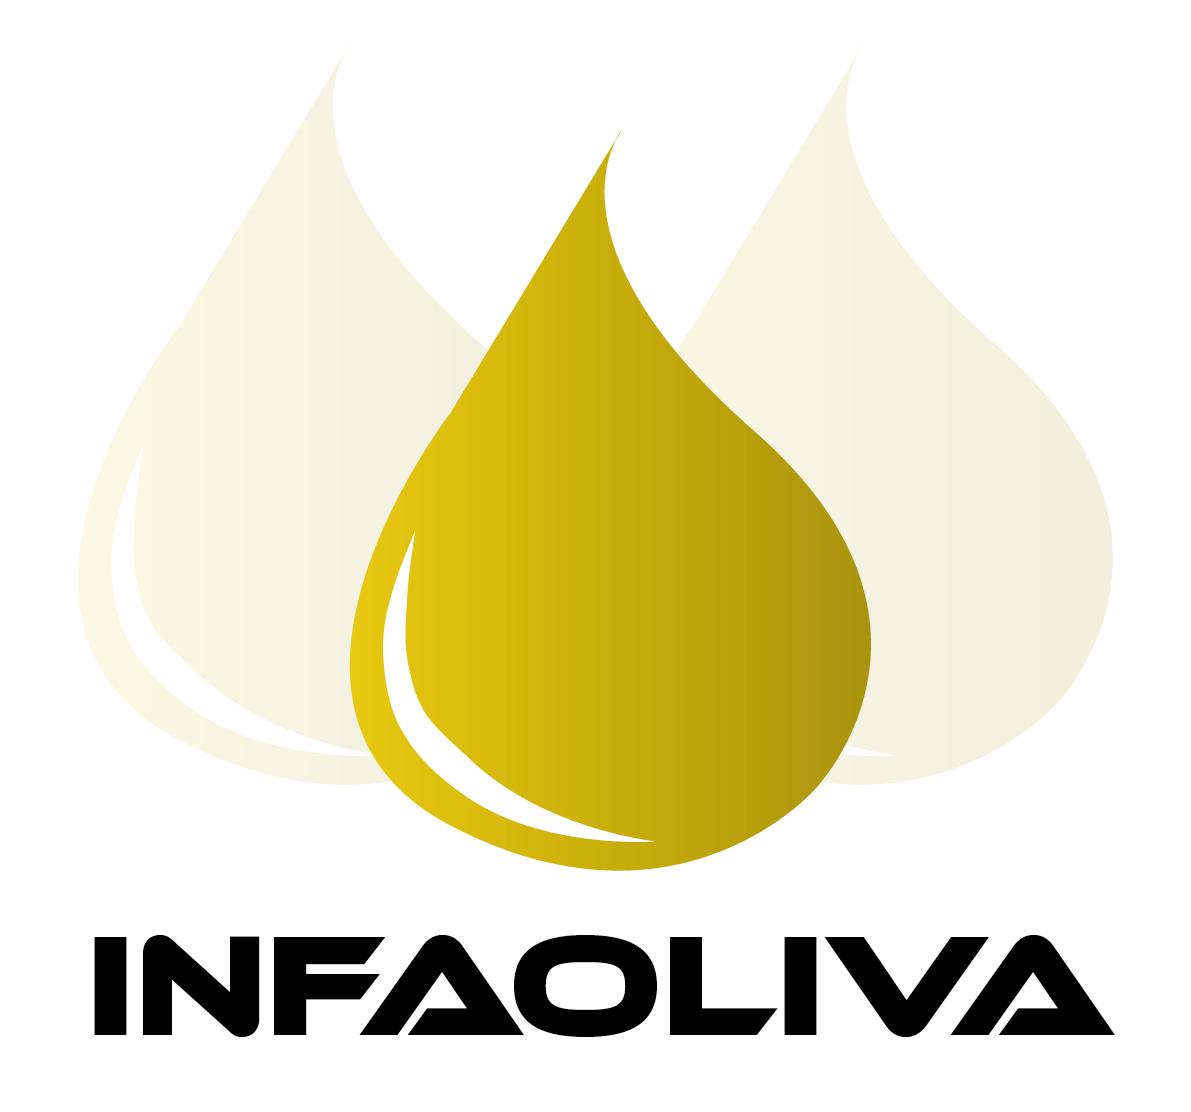 infaoliva precio del aceite de oliva